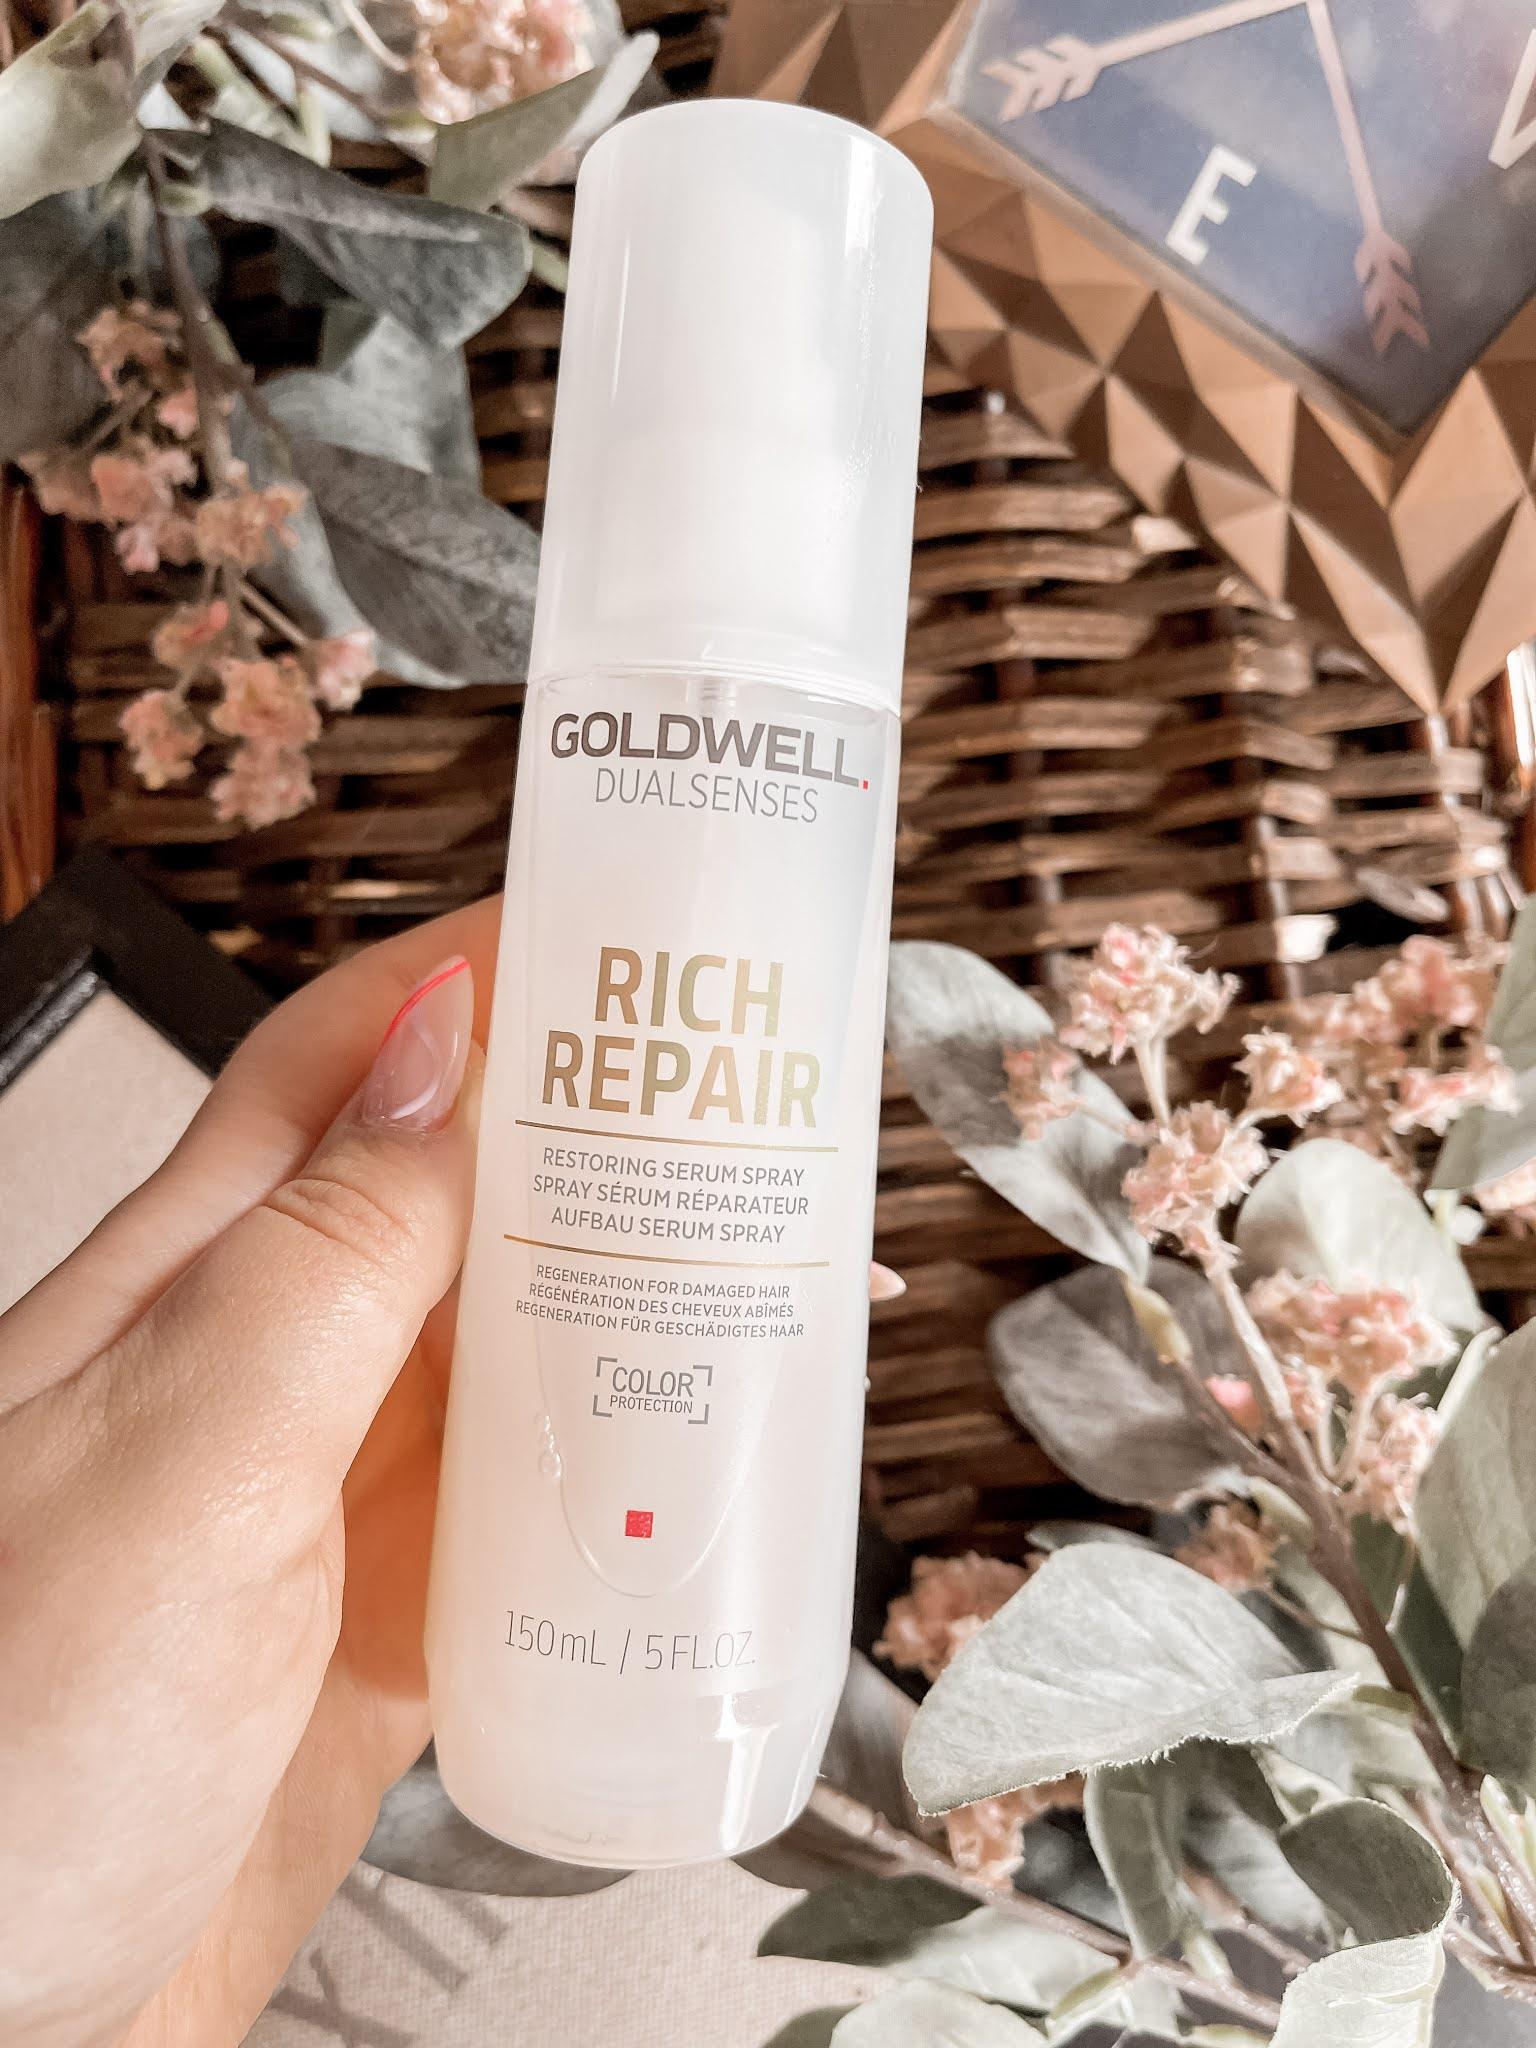 Dualsenses Rich repair de Goldwell